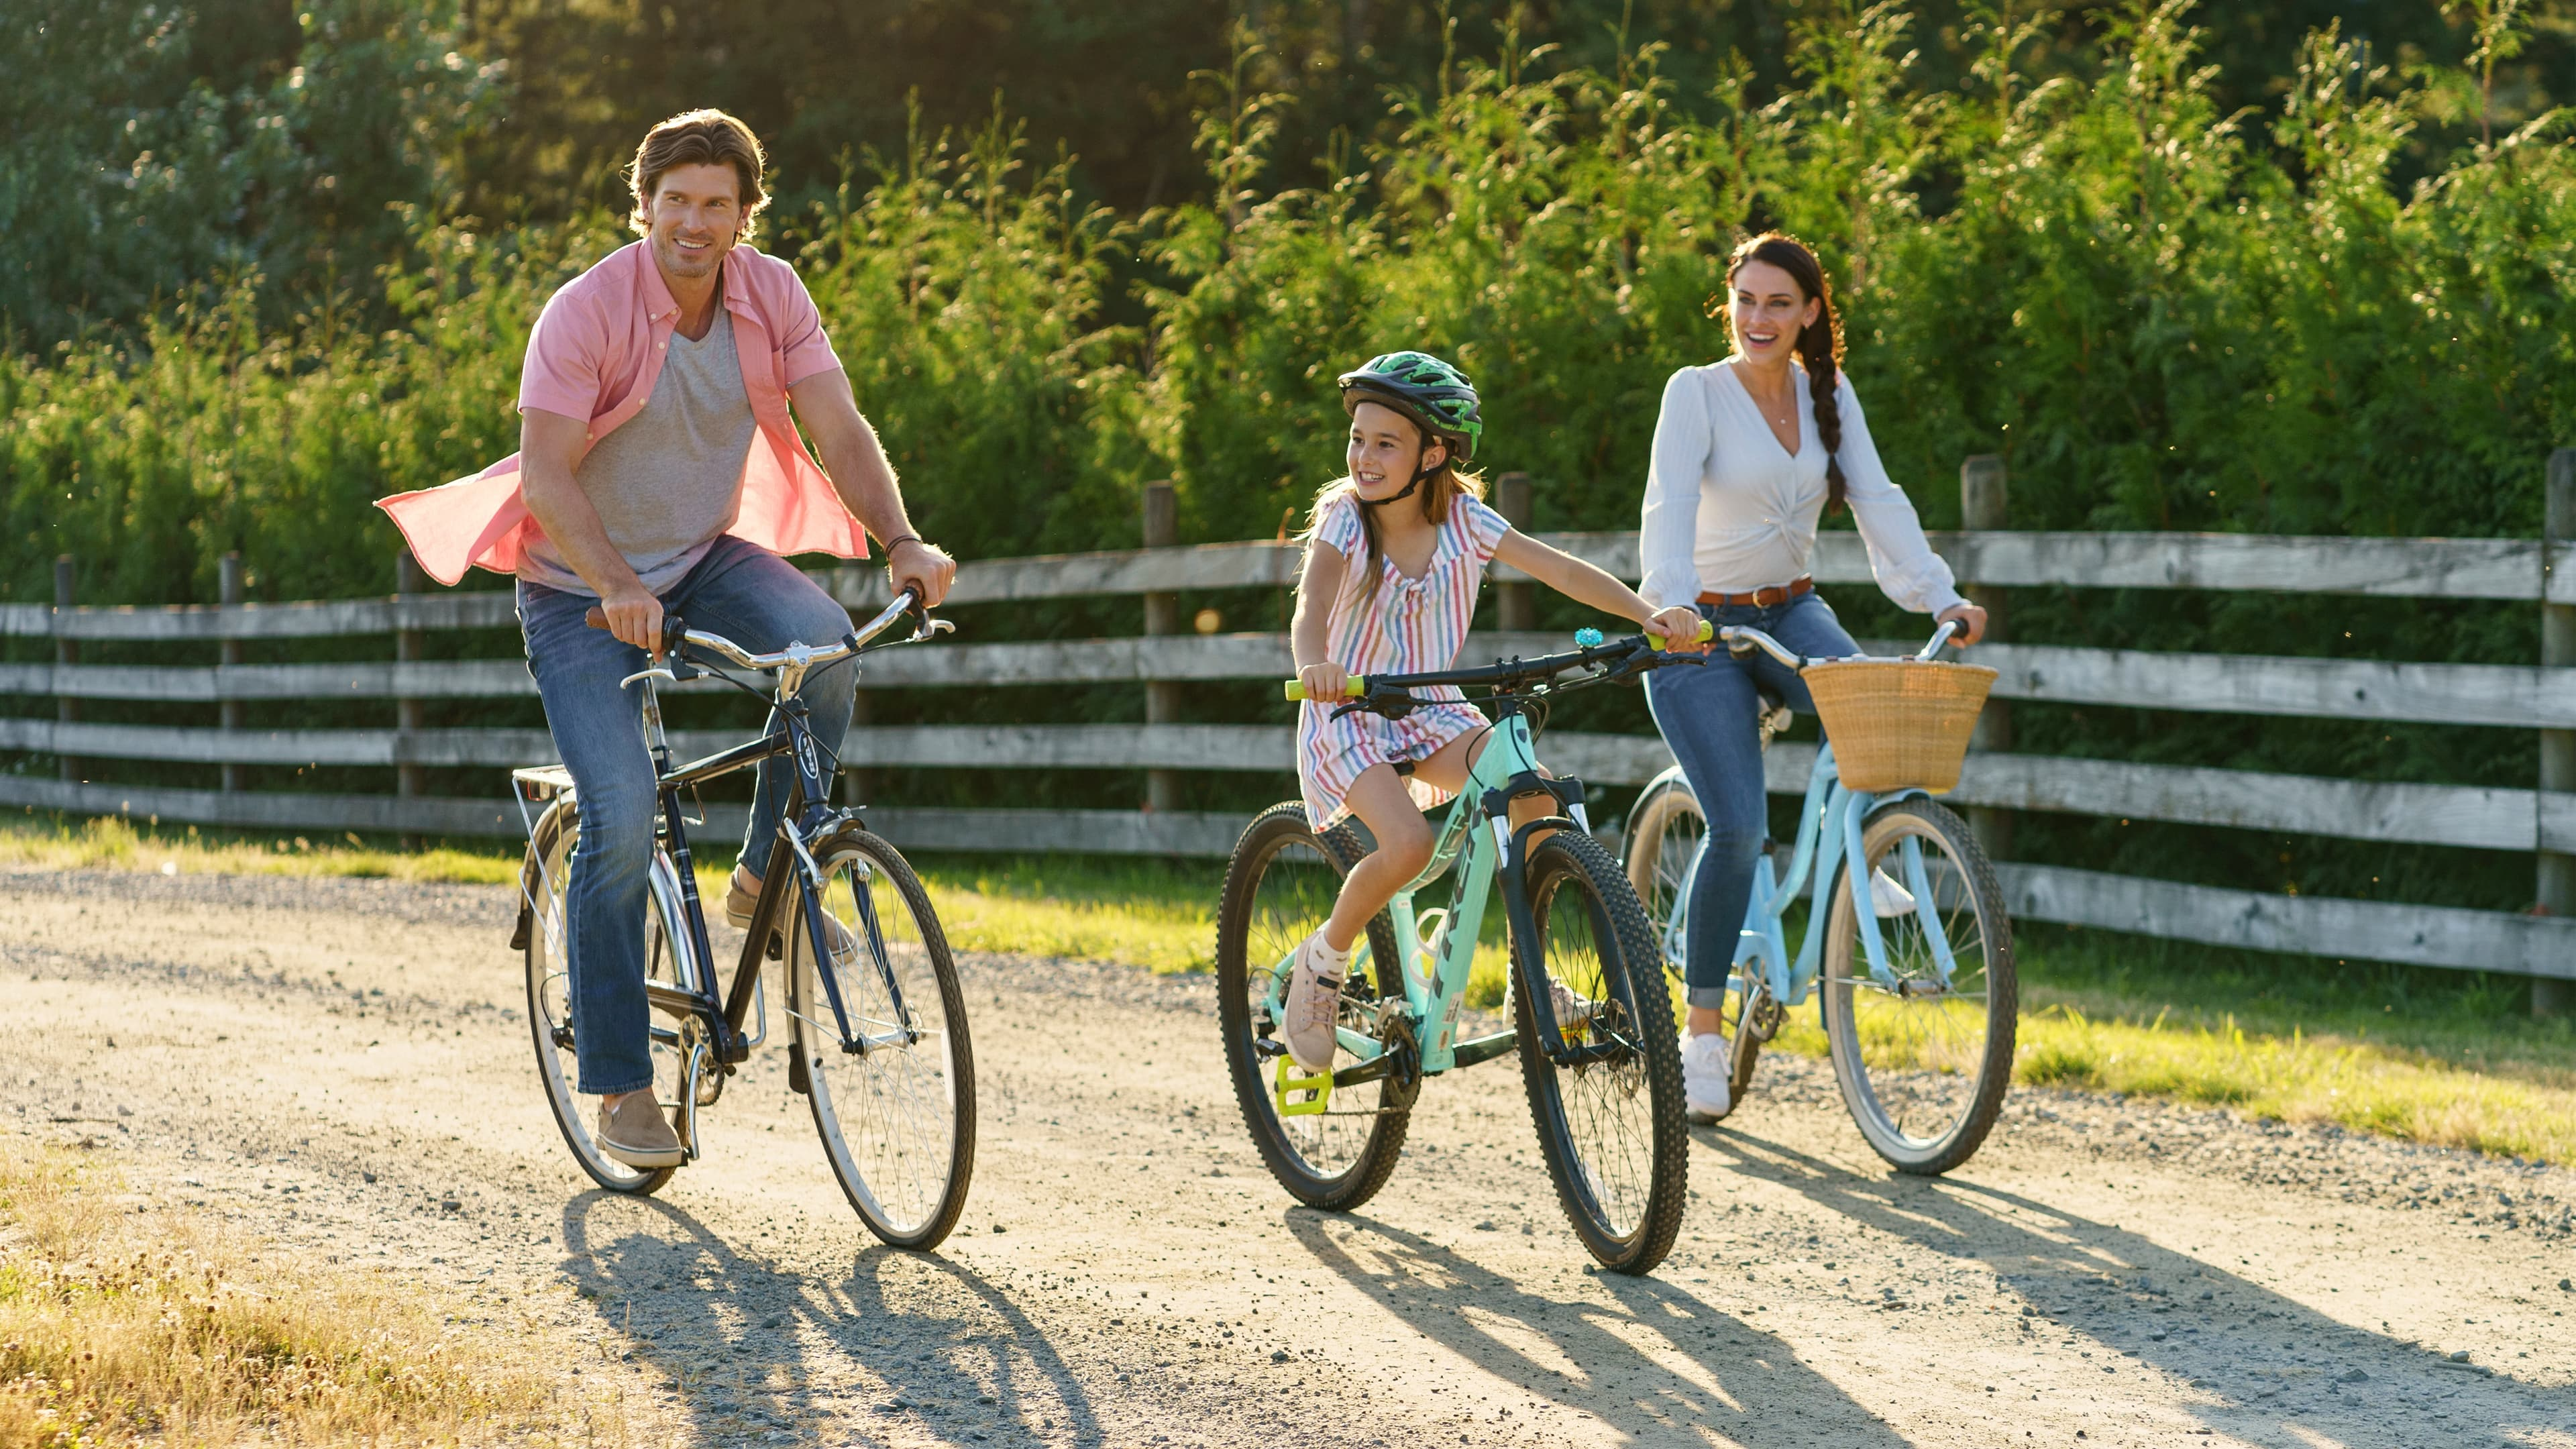 High Flying Romance (2021) English Full Movie Watch Online